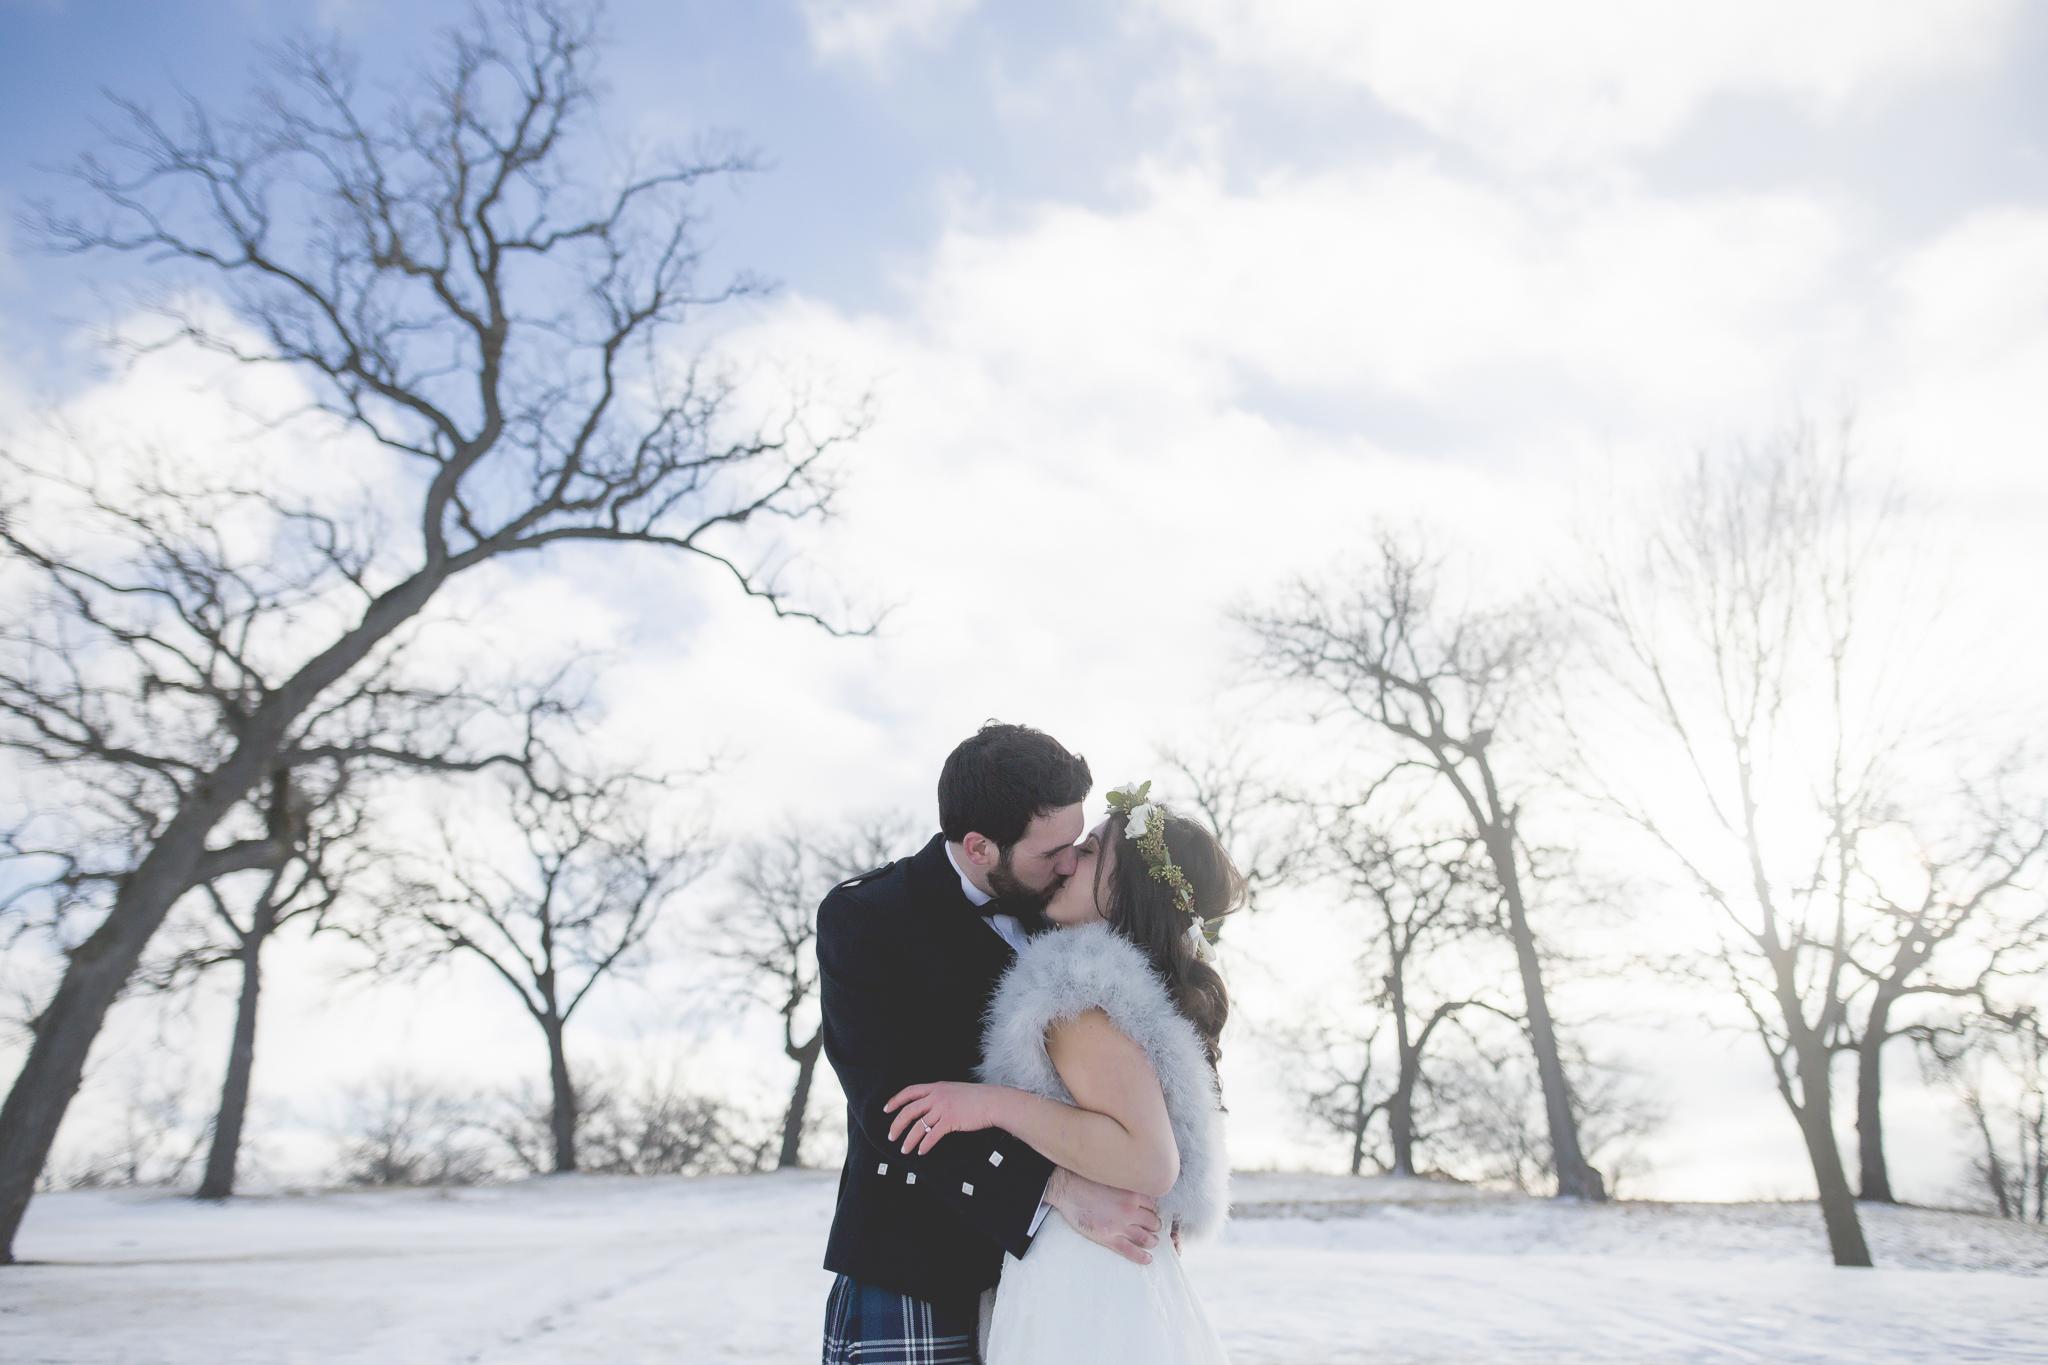 minneapolis winter wedding photographer-17.jpg